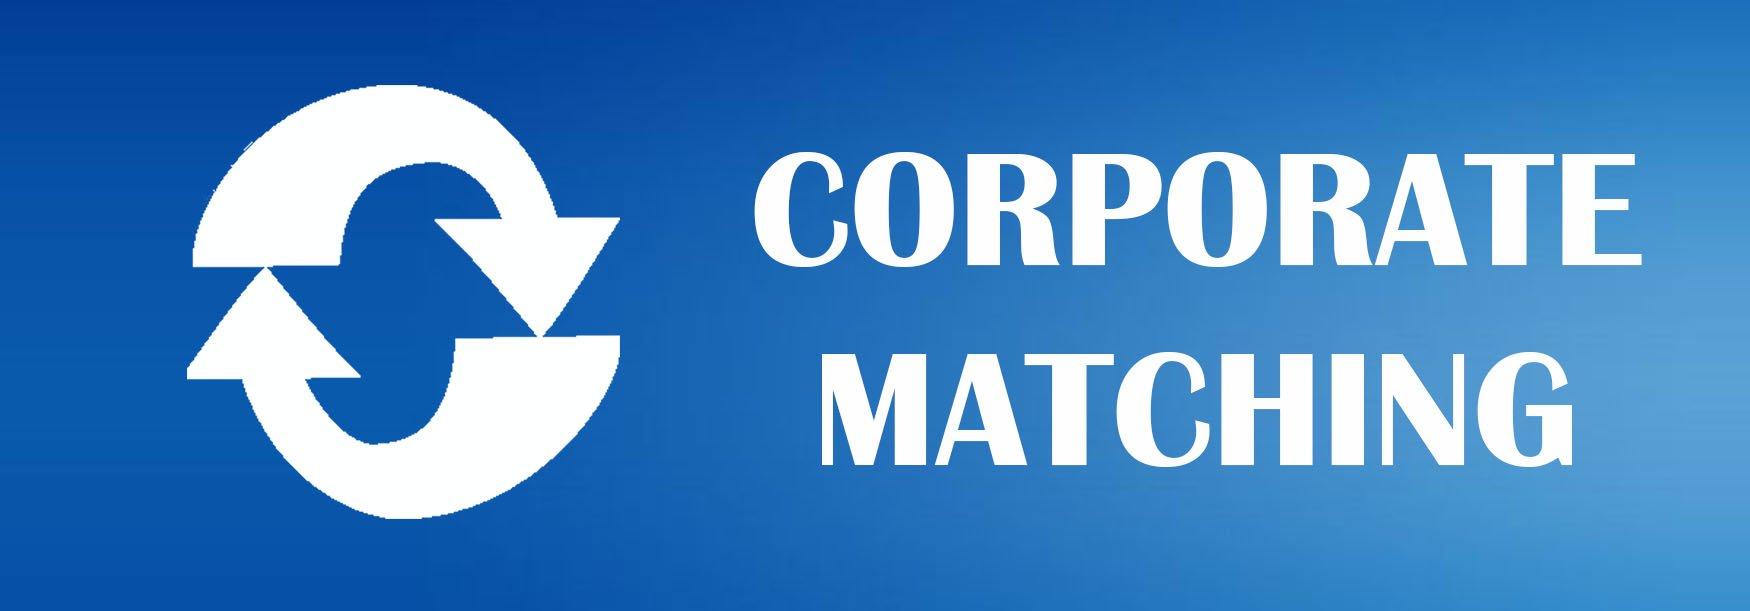 corporate matching